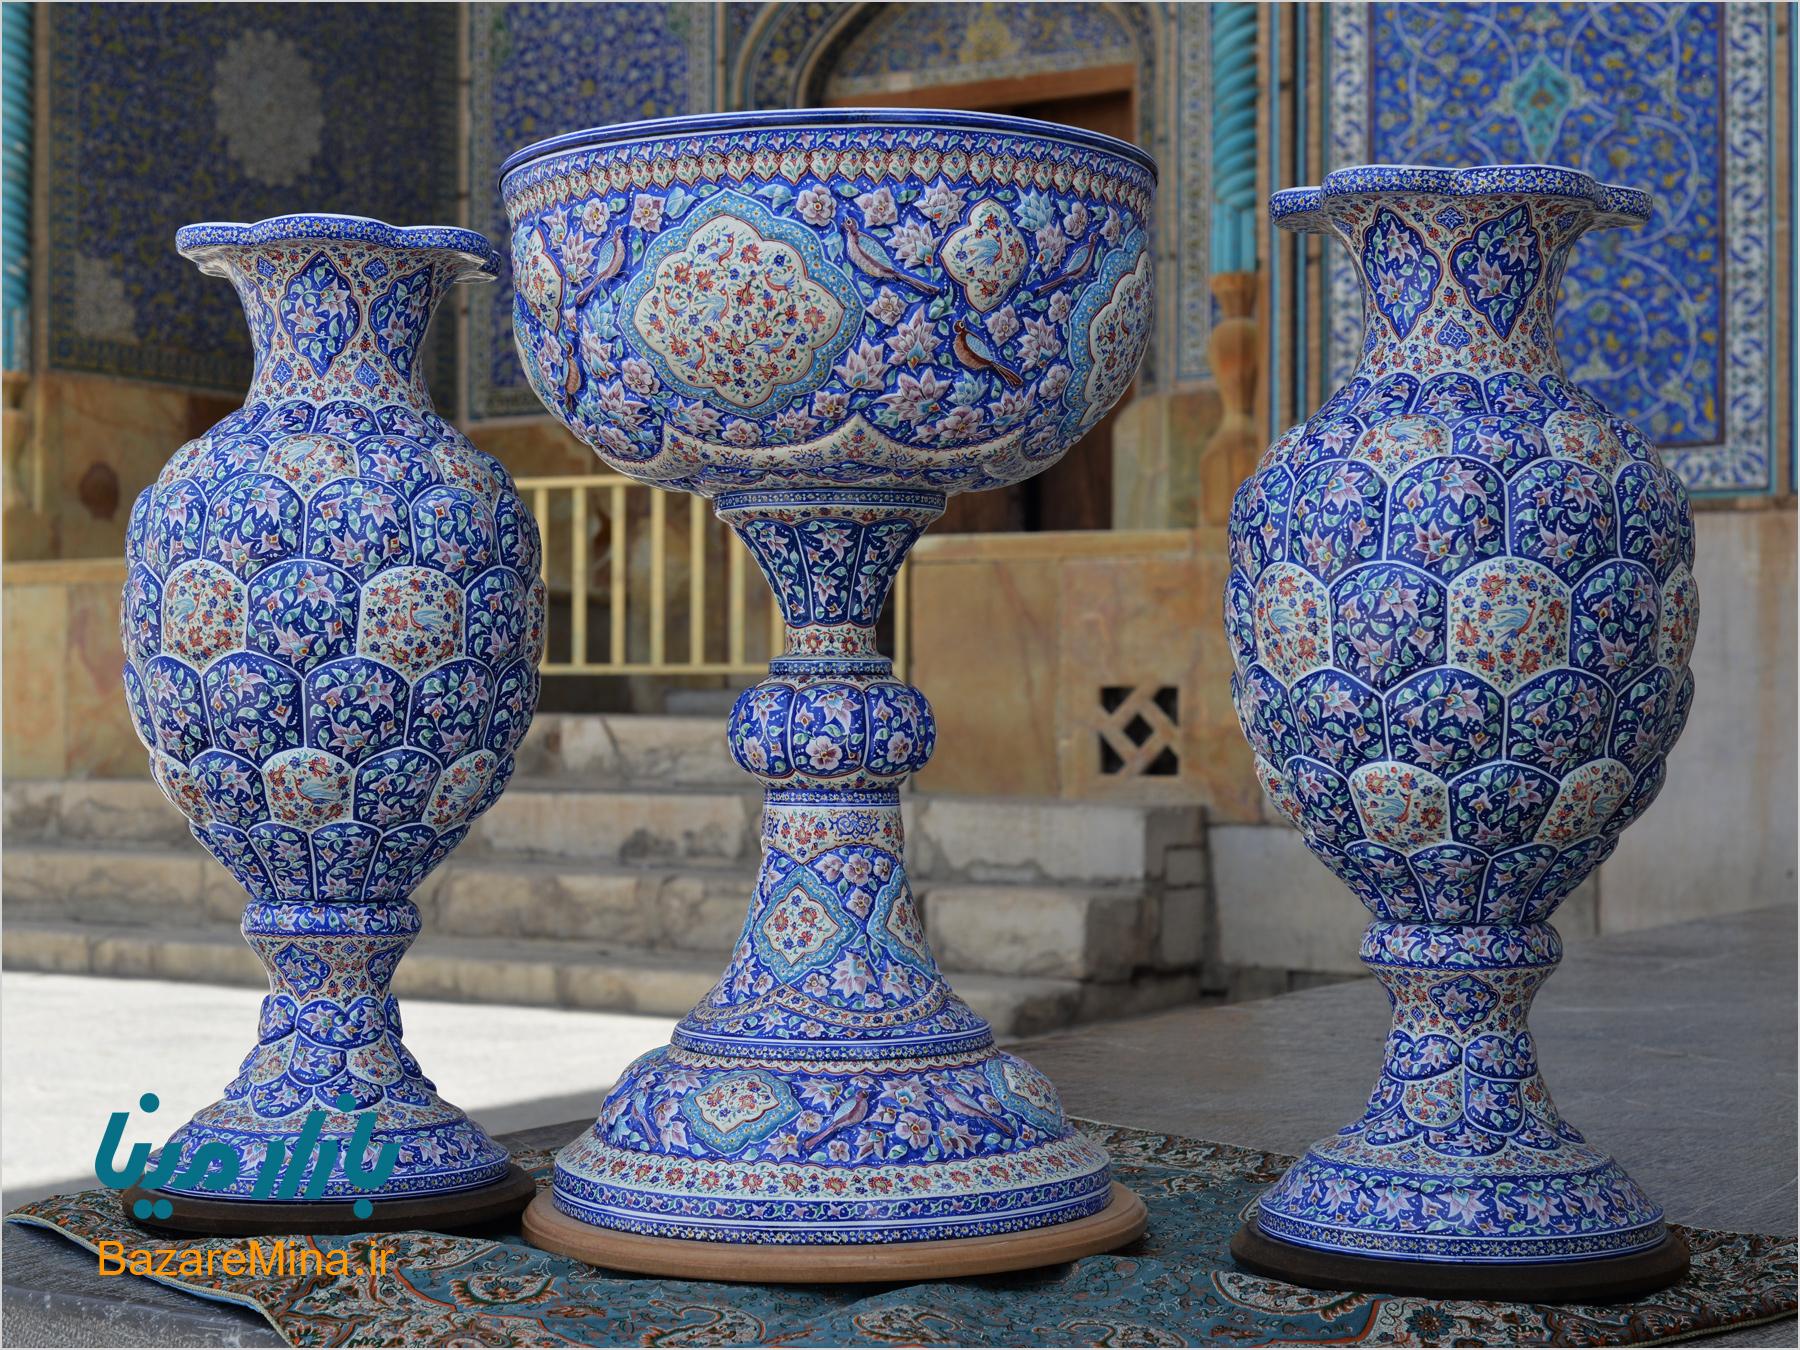 هنر لوکس میناکاری اصفهان